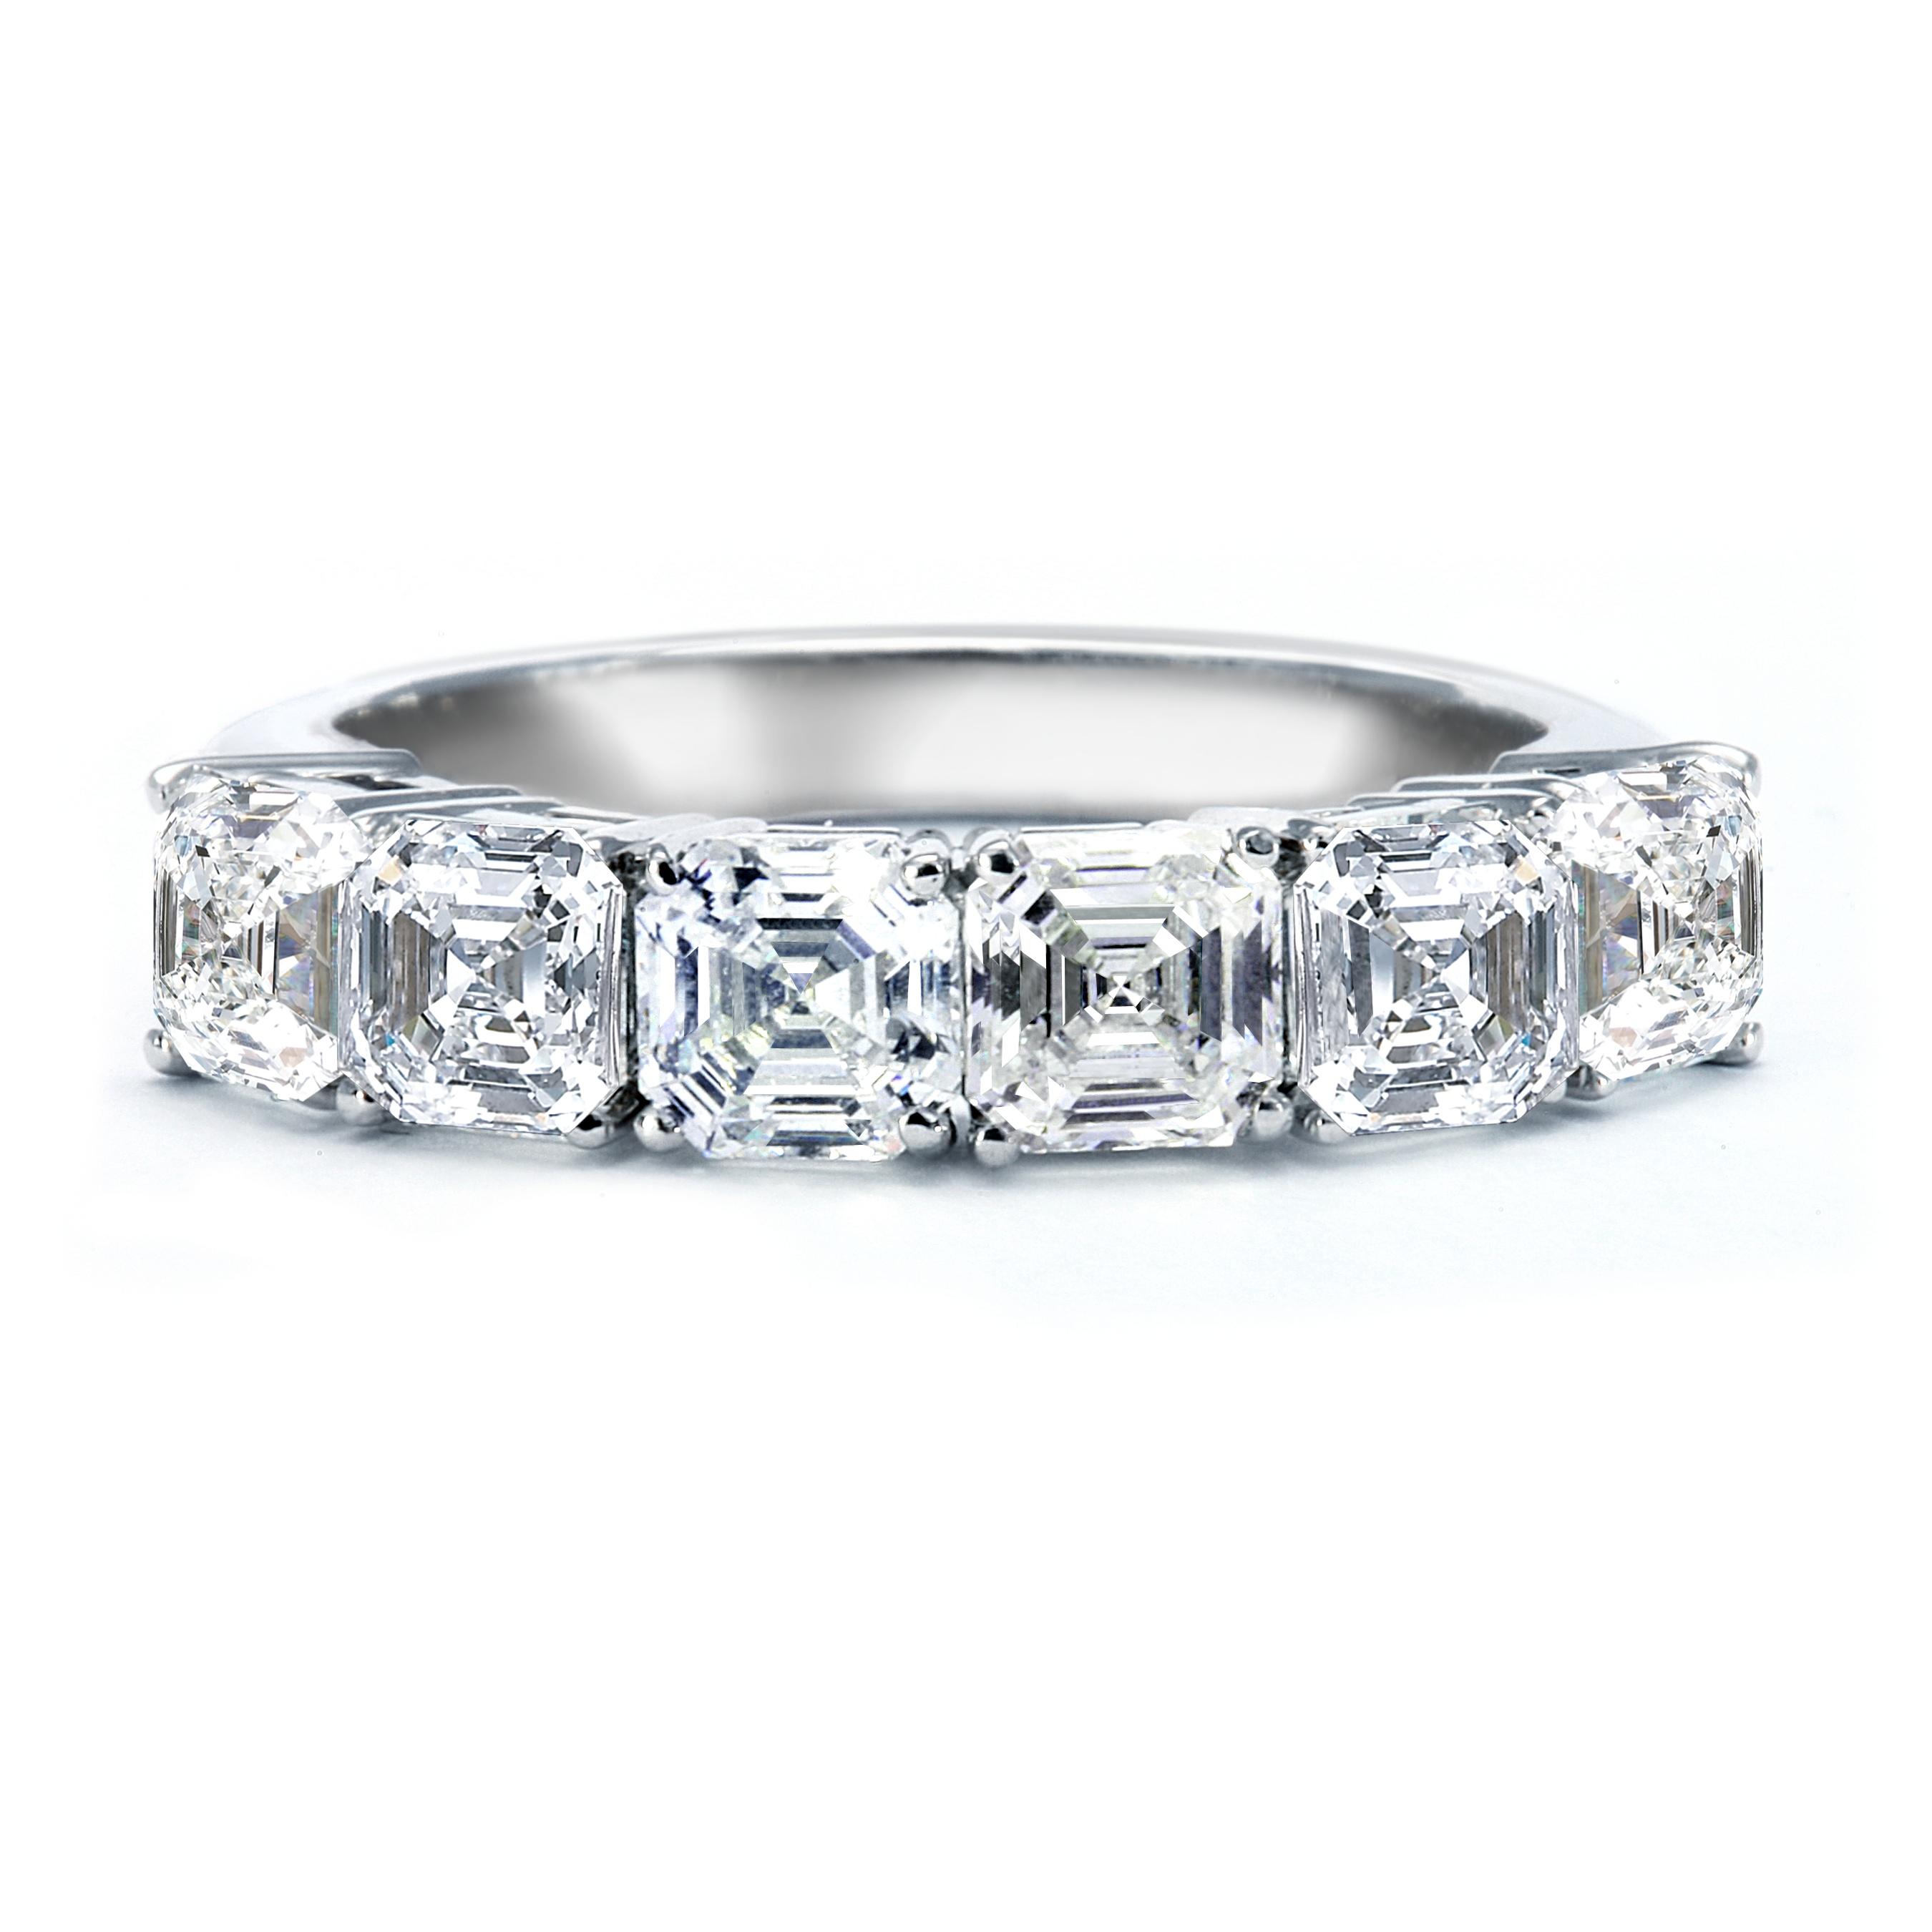 royal asscher engagement ring style av b 2 126 onewed